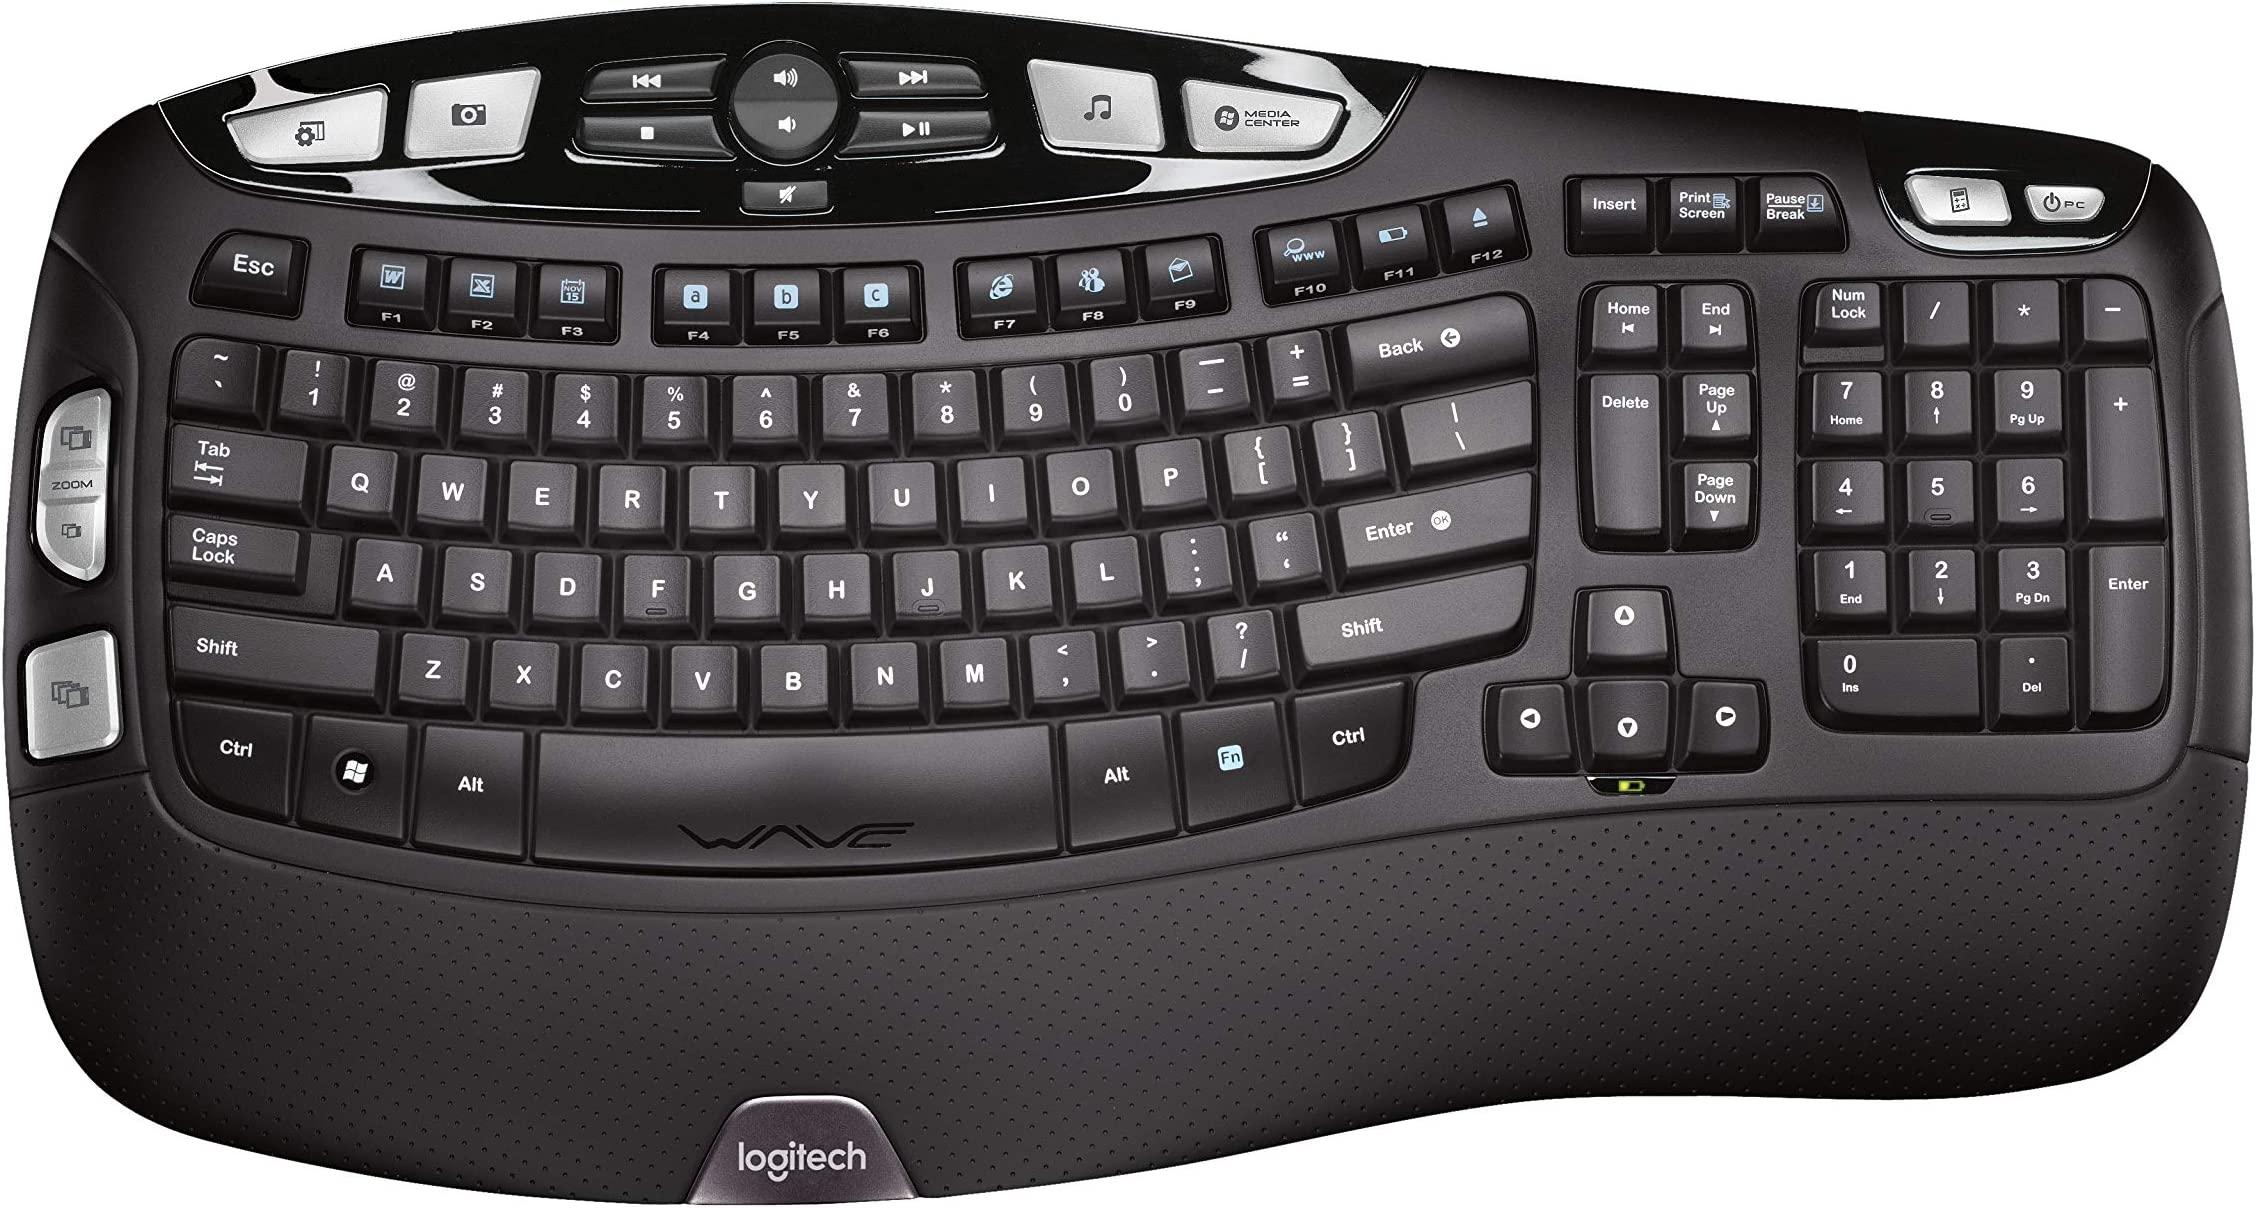 Logitech K350 Wireless Wave Keyboard with Unifying Wireless Technology - Black